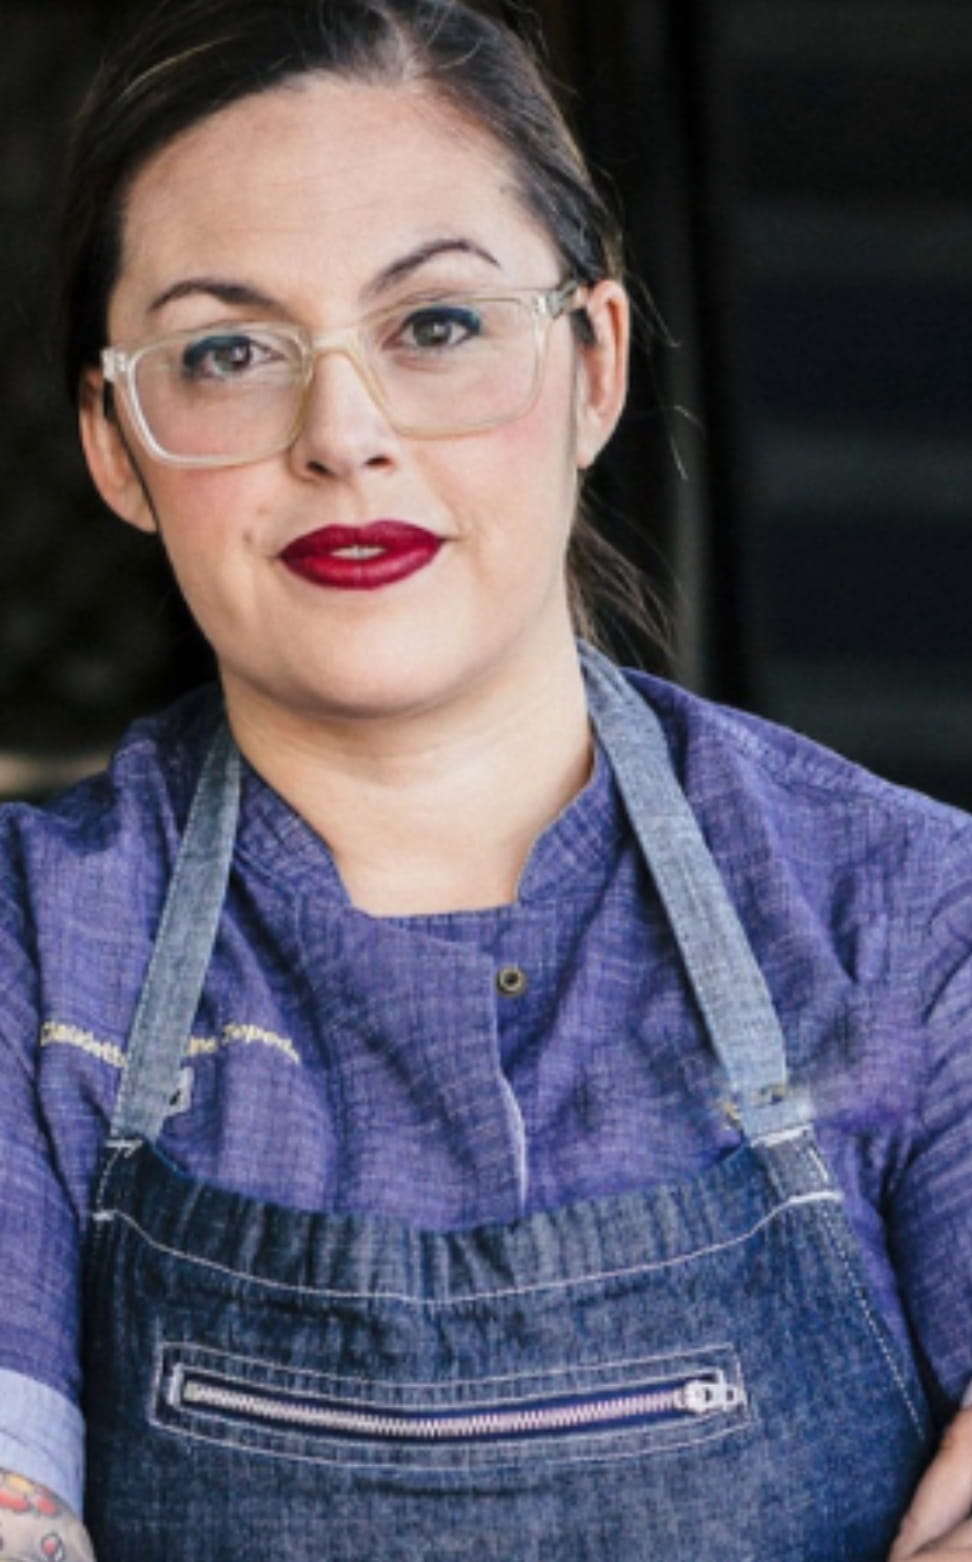 Chef Claudette Zepeda Wilkins